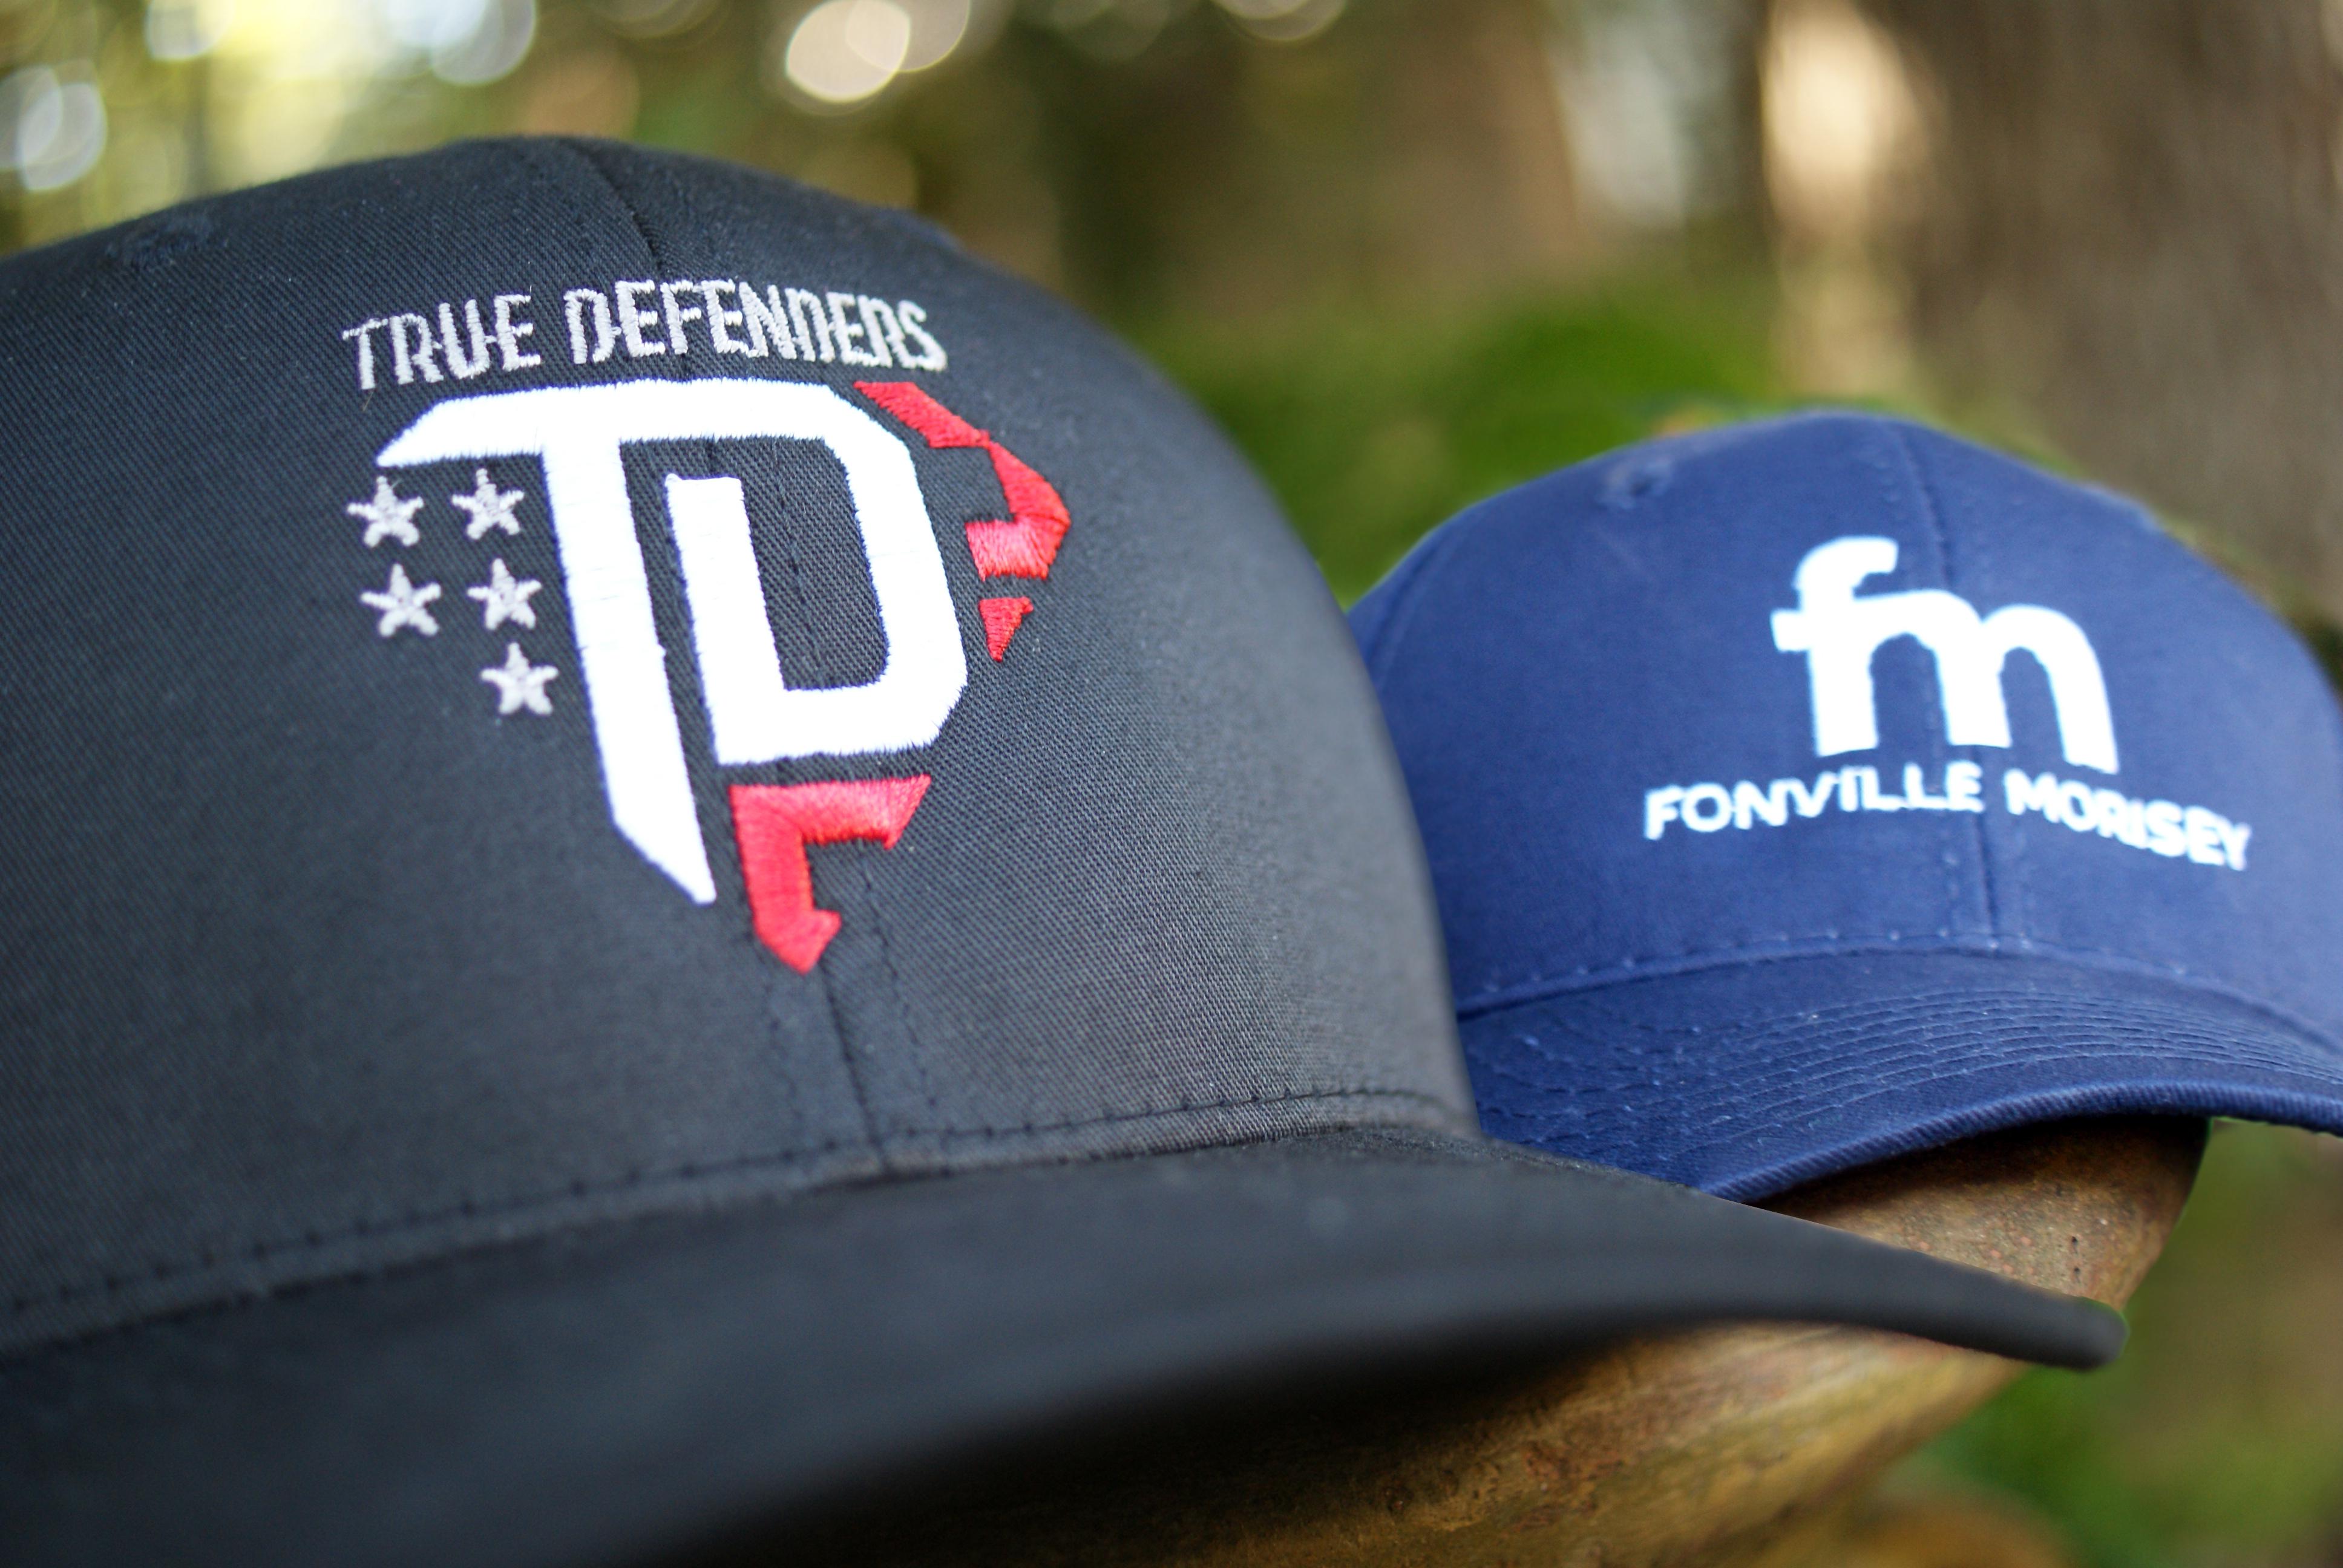 True Defenders Carolina Hurricanes FM Image